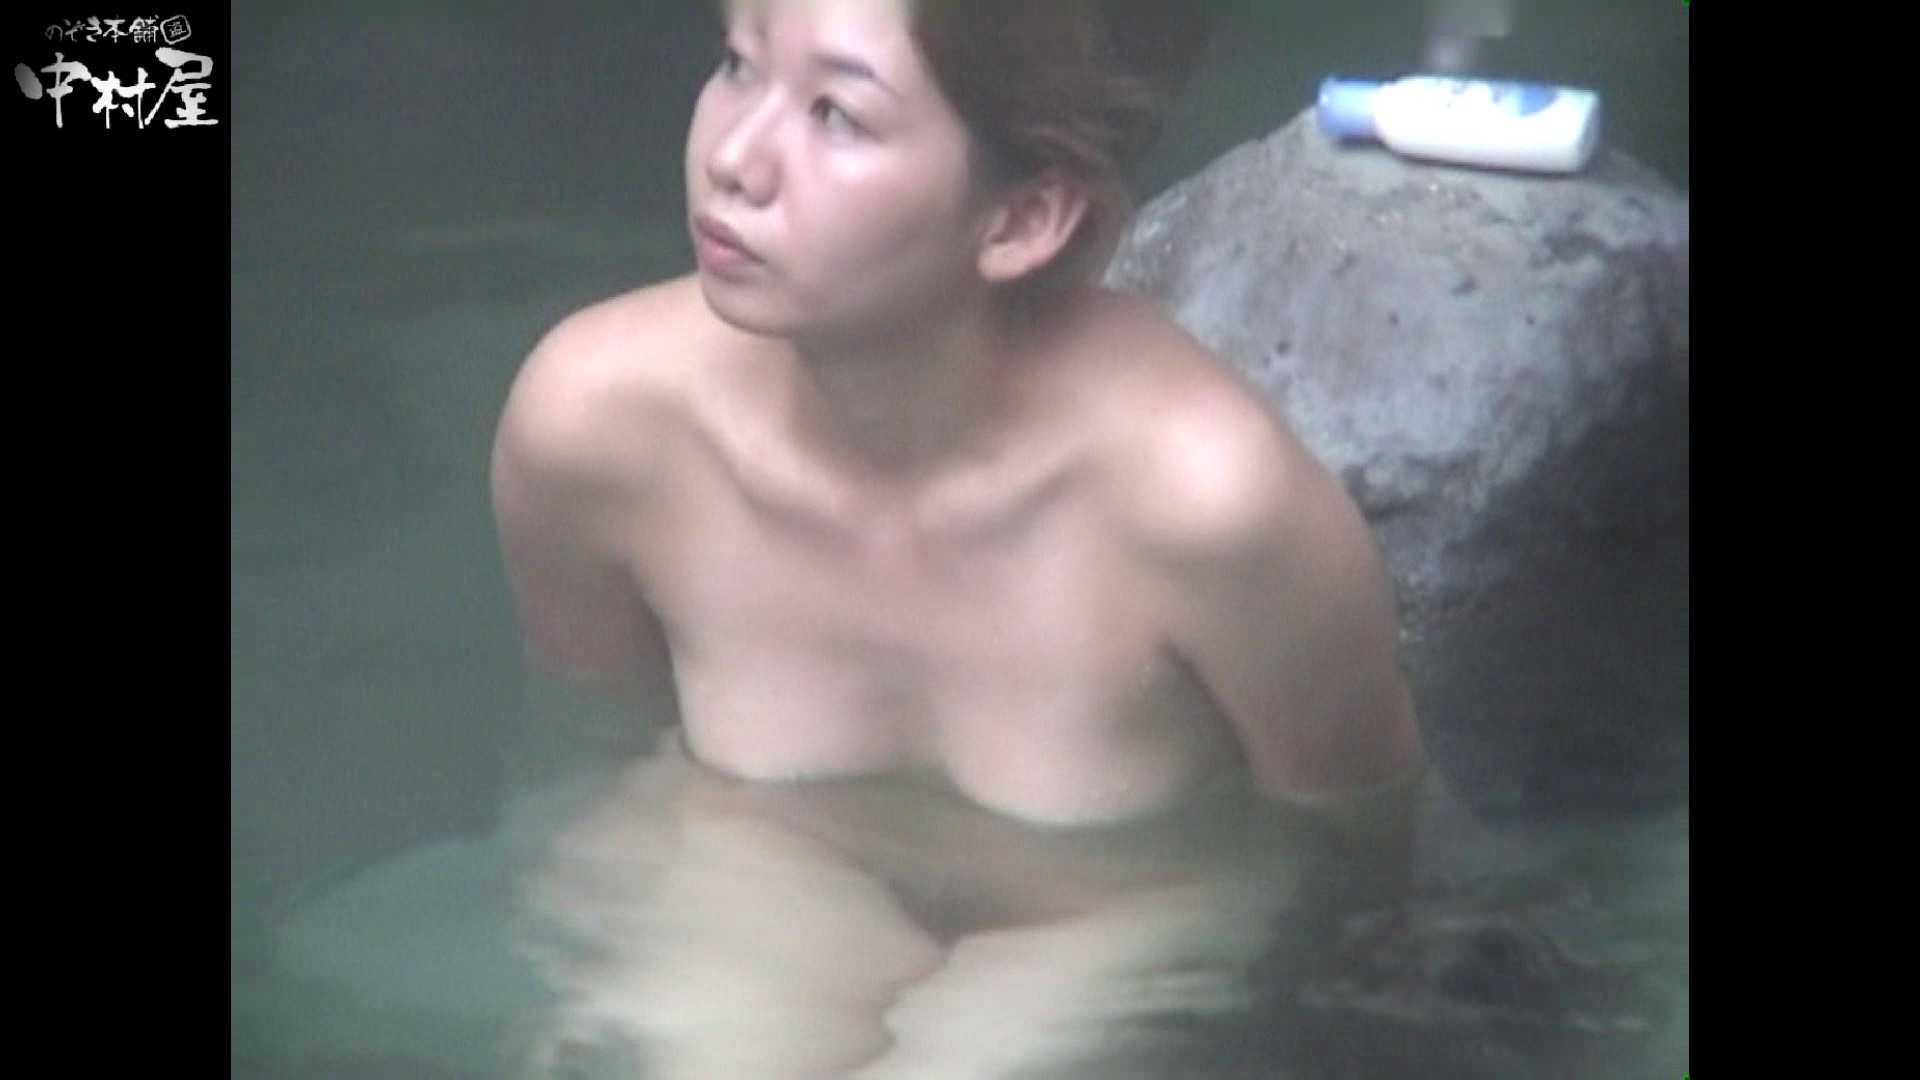 Aquaな露天風呂Vol.951 盗撮師作品 | 露天風呂突入  96pic 55